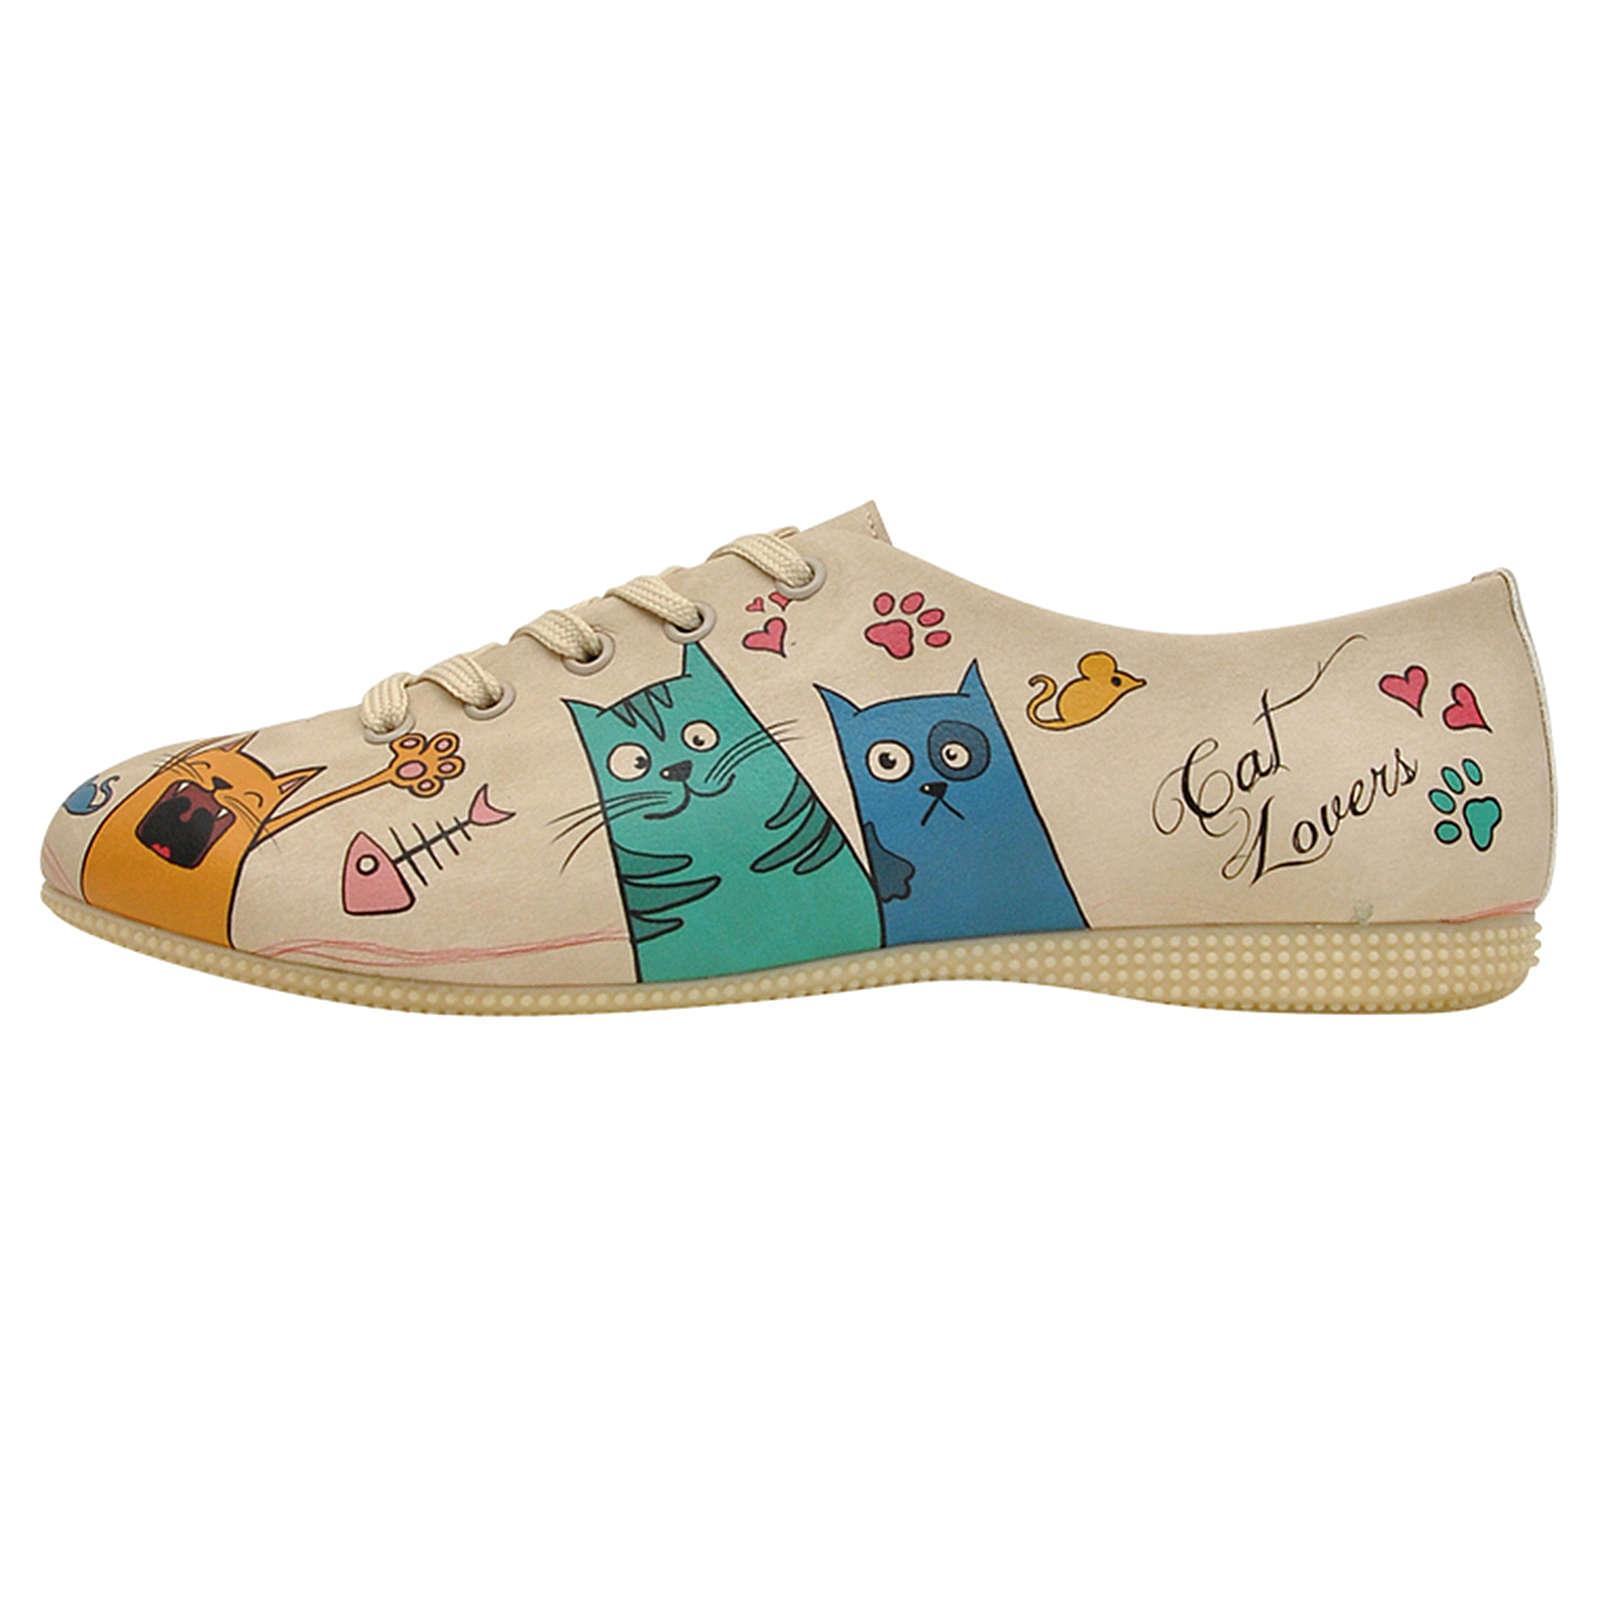 Dogo Shoes Schnürschuhe Cat Lovers mehrfarbig Damen Gr. 38